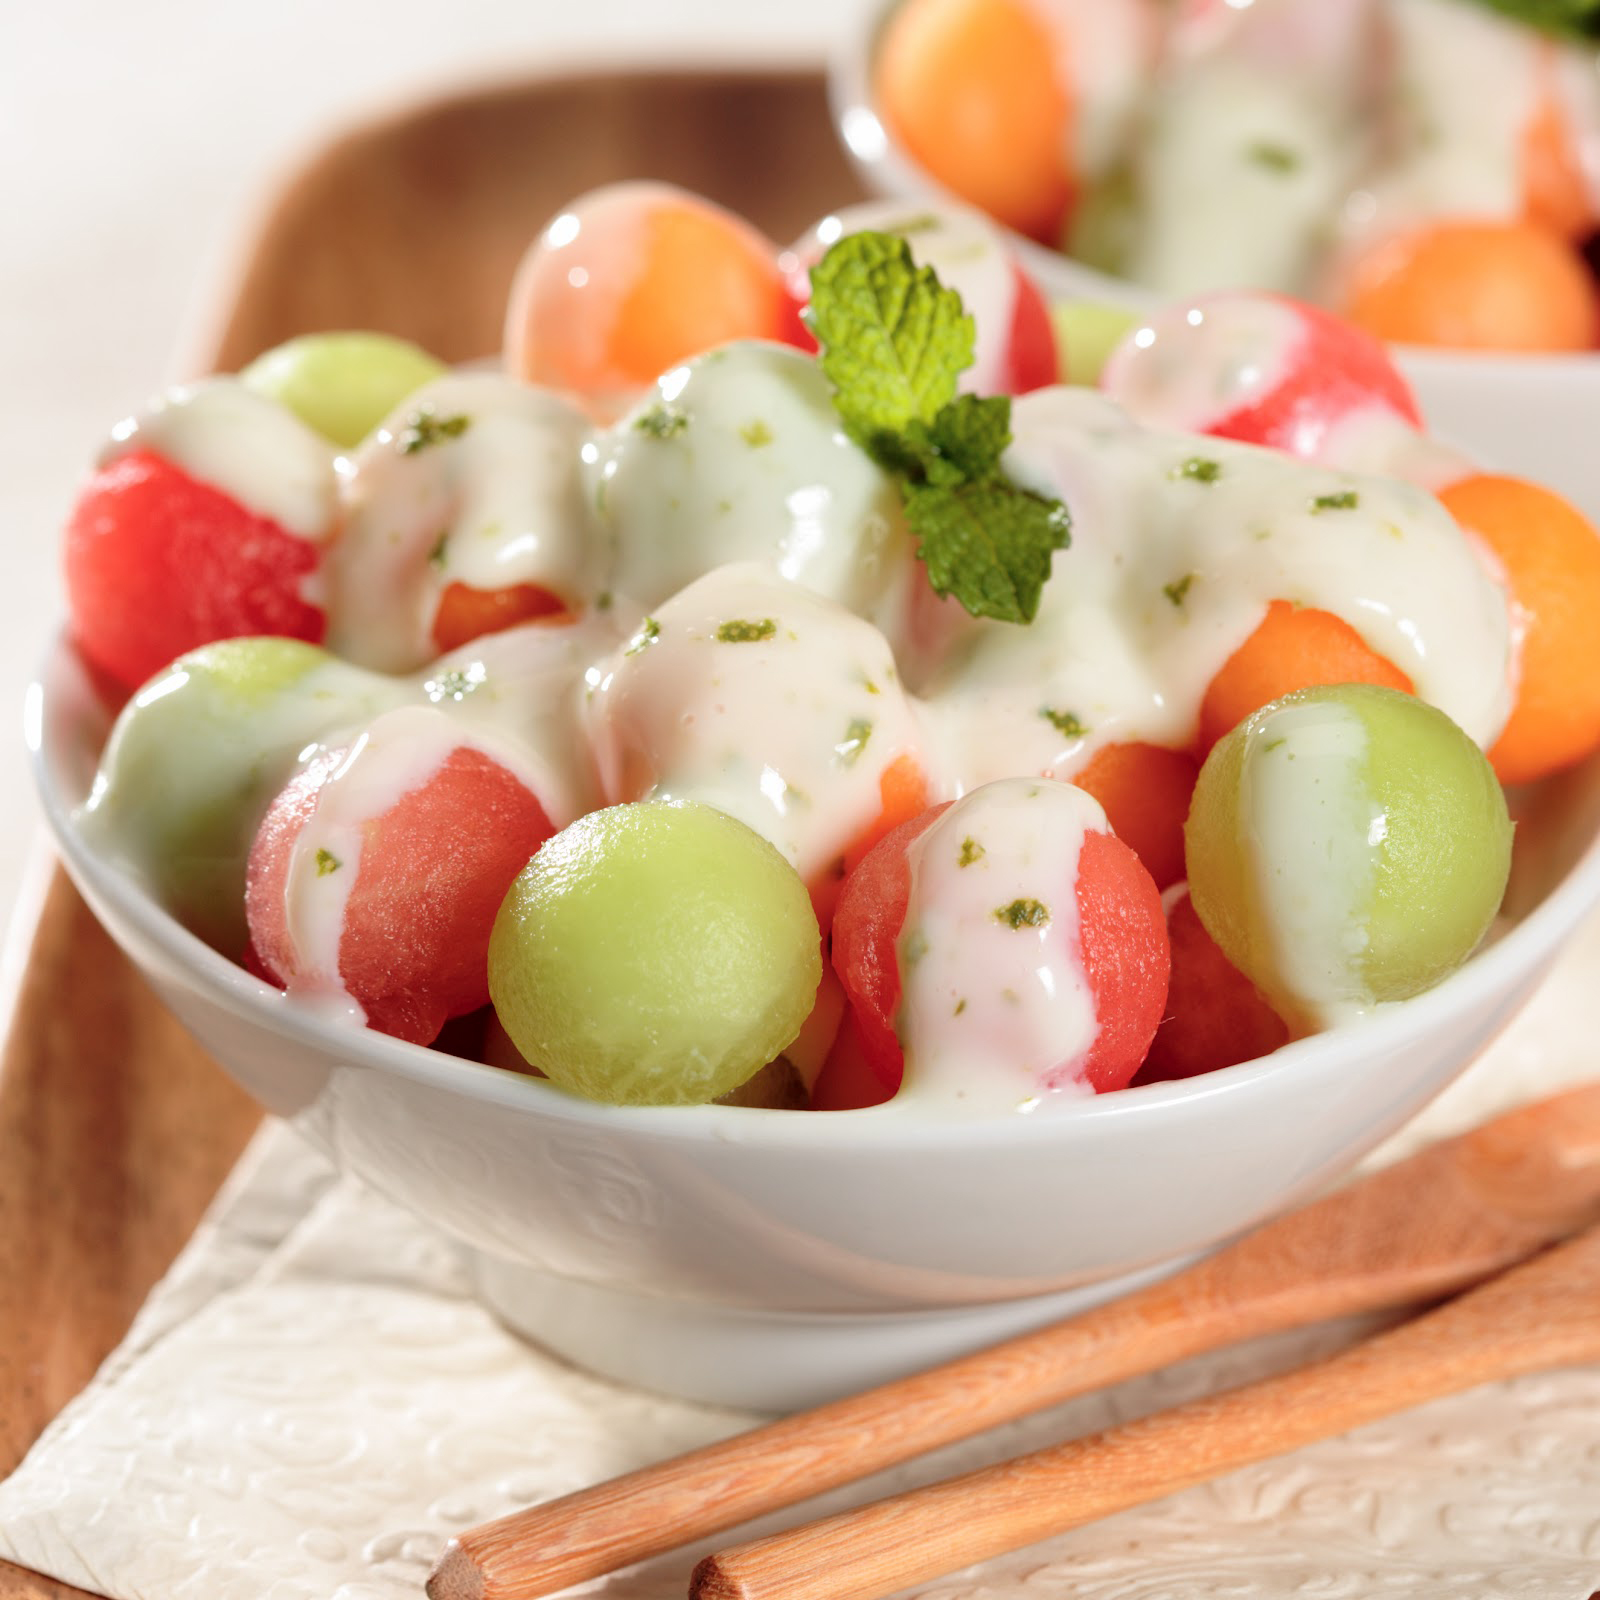 Melon-balls-with-Tangy-La-Lechera-Sauce